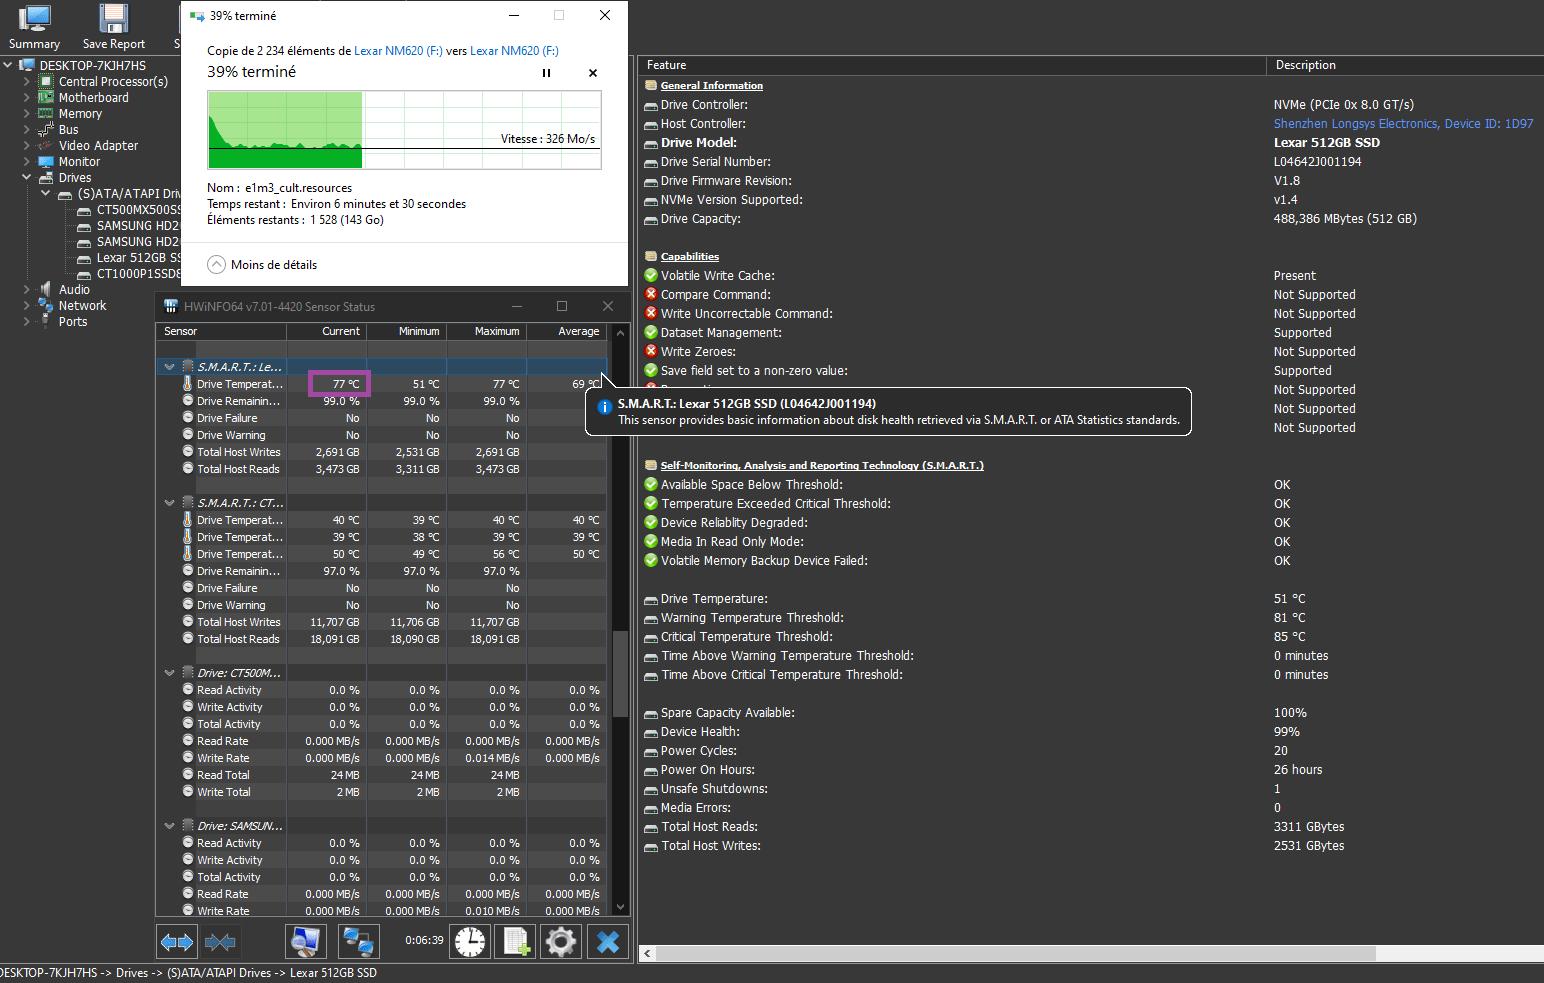 Lexar Ssd Nm620 512 Go Gb Hwinfo Benchmark Omgpu Test Temperature